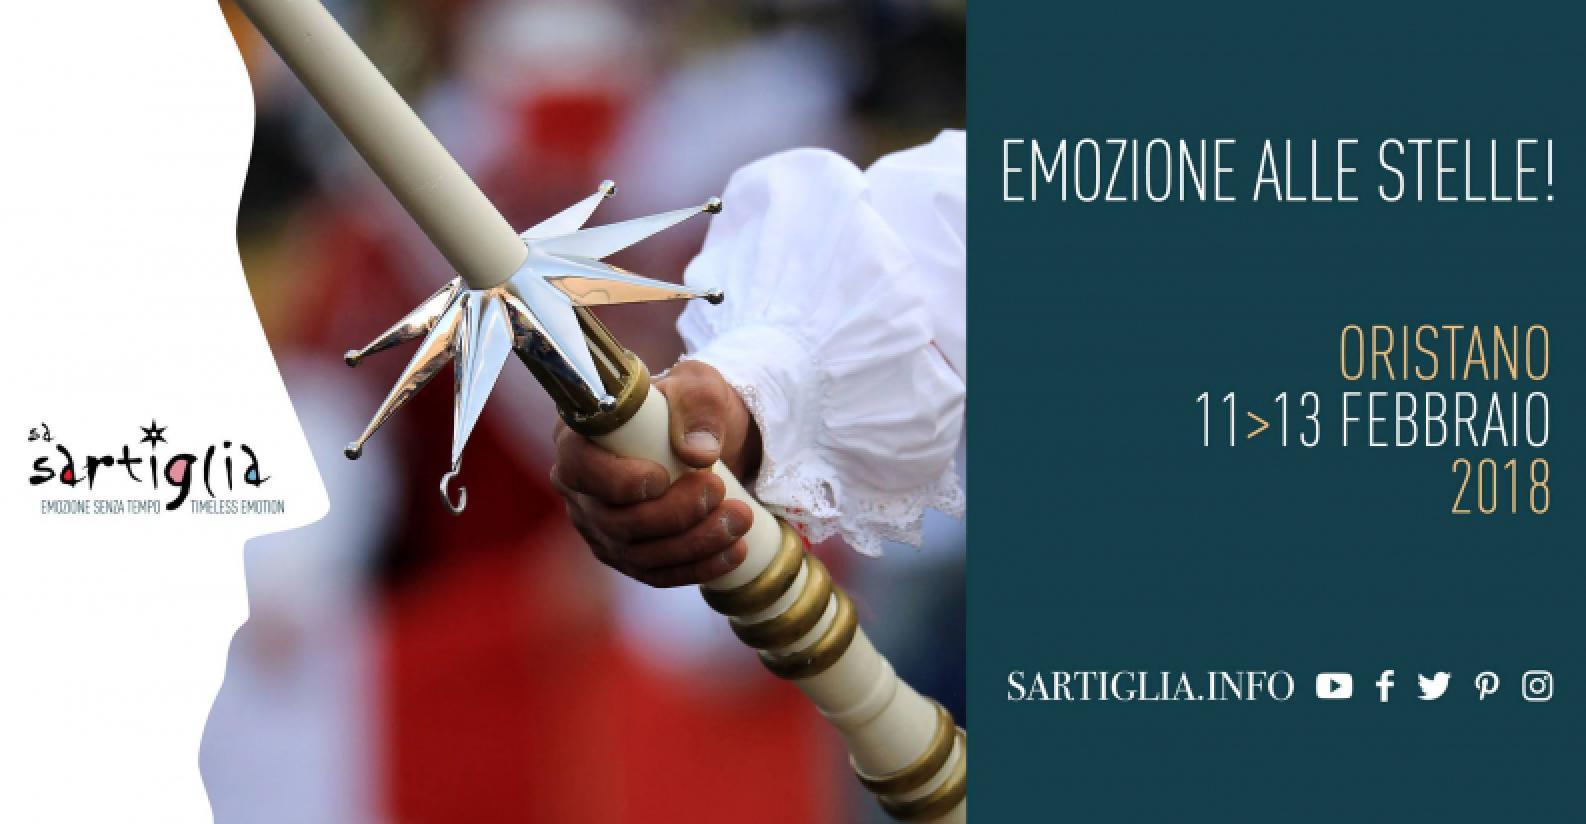 Sa Sartiglia (locandina)